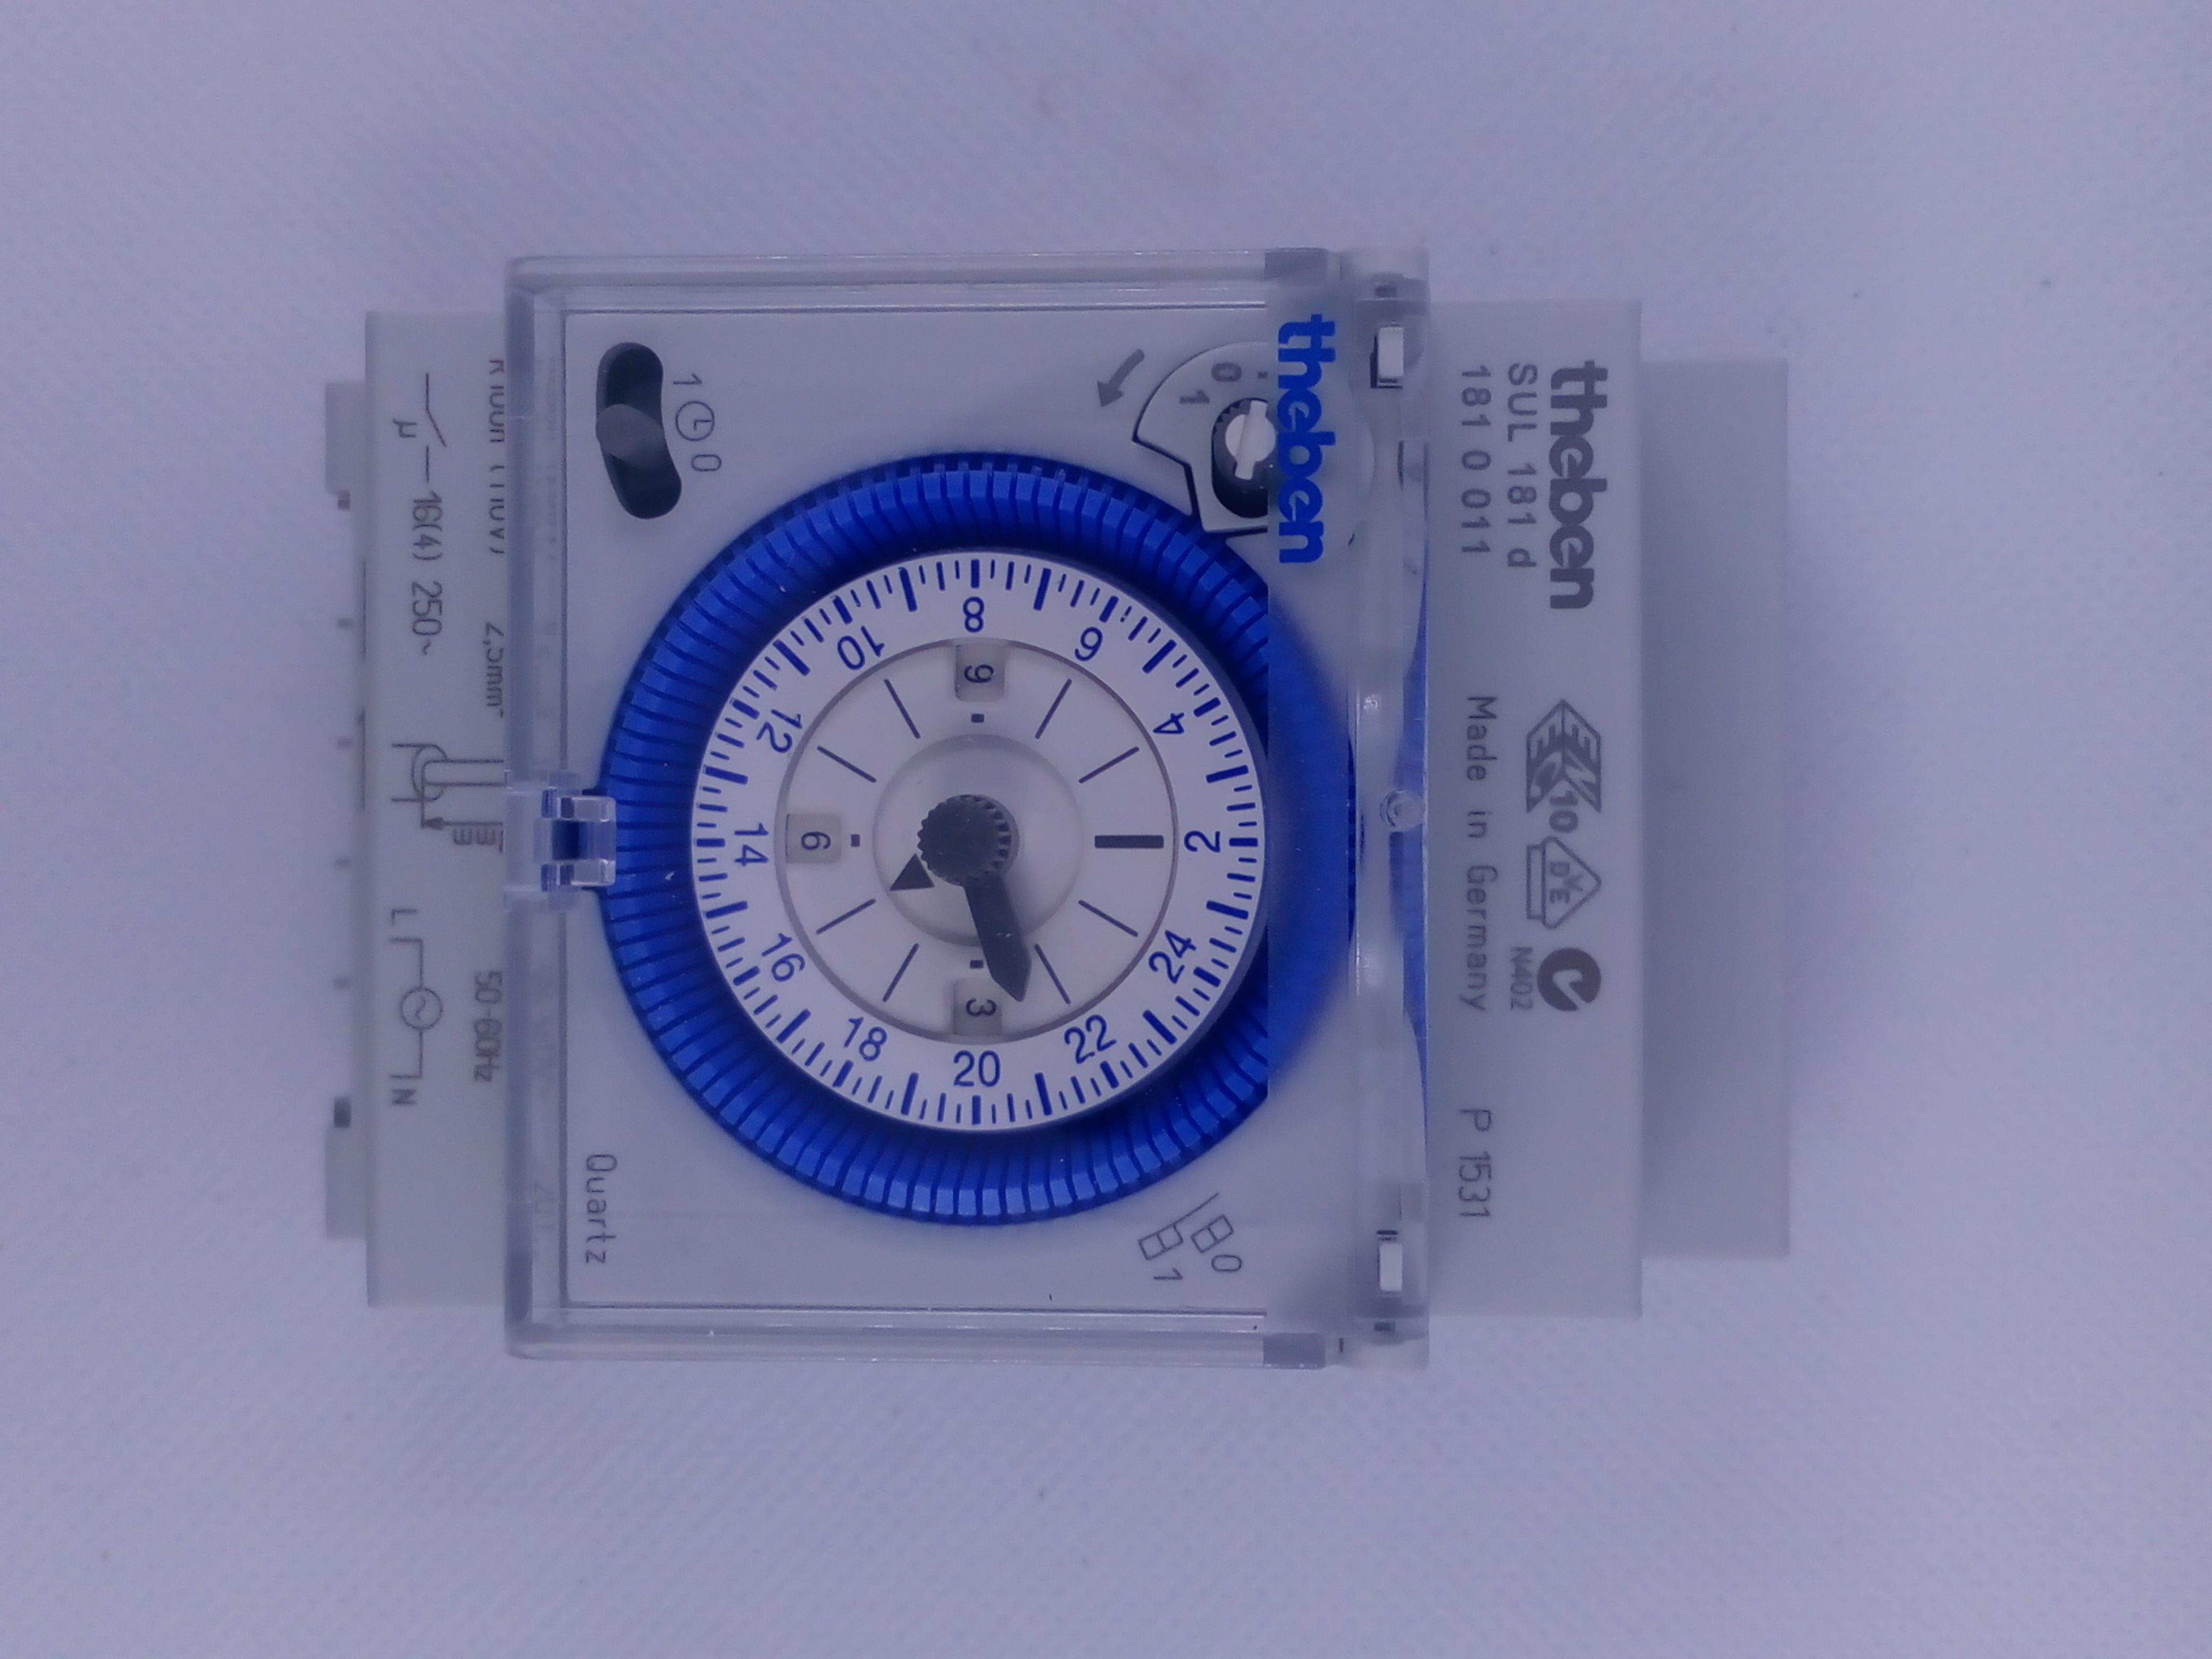 Jual Analog Time Switch Theben Sul 181 D Harga Murah